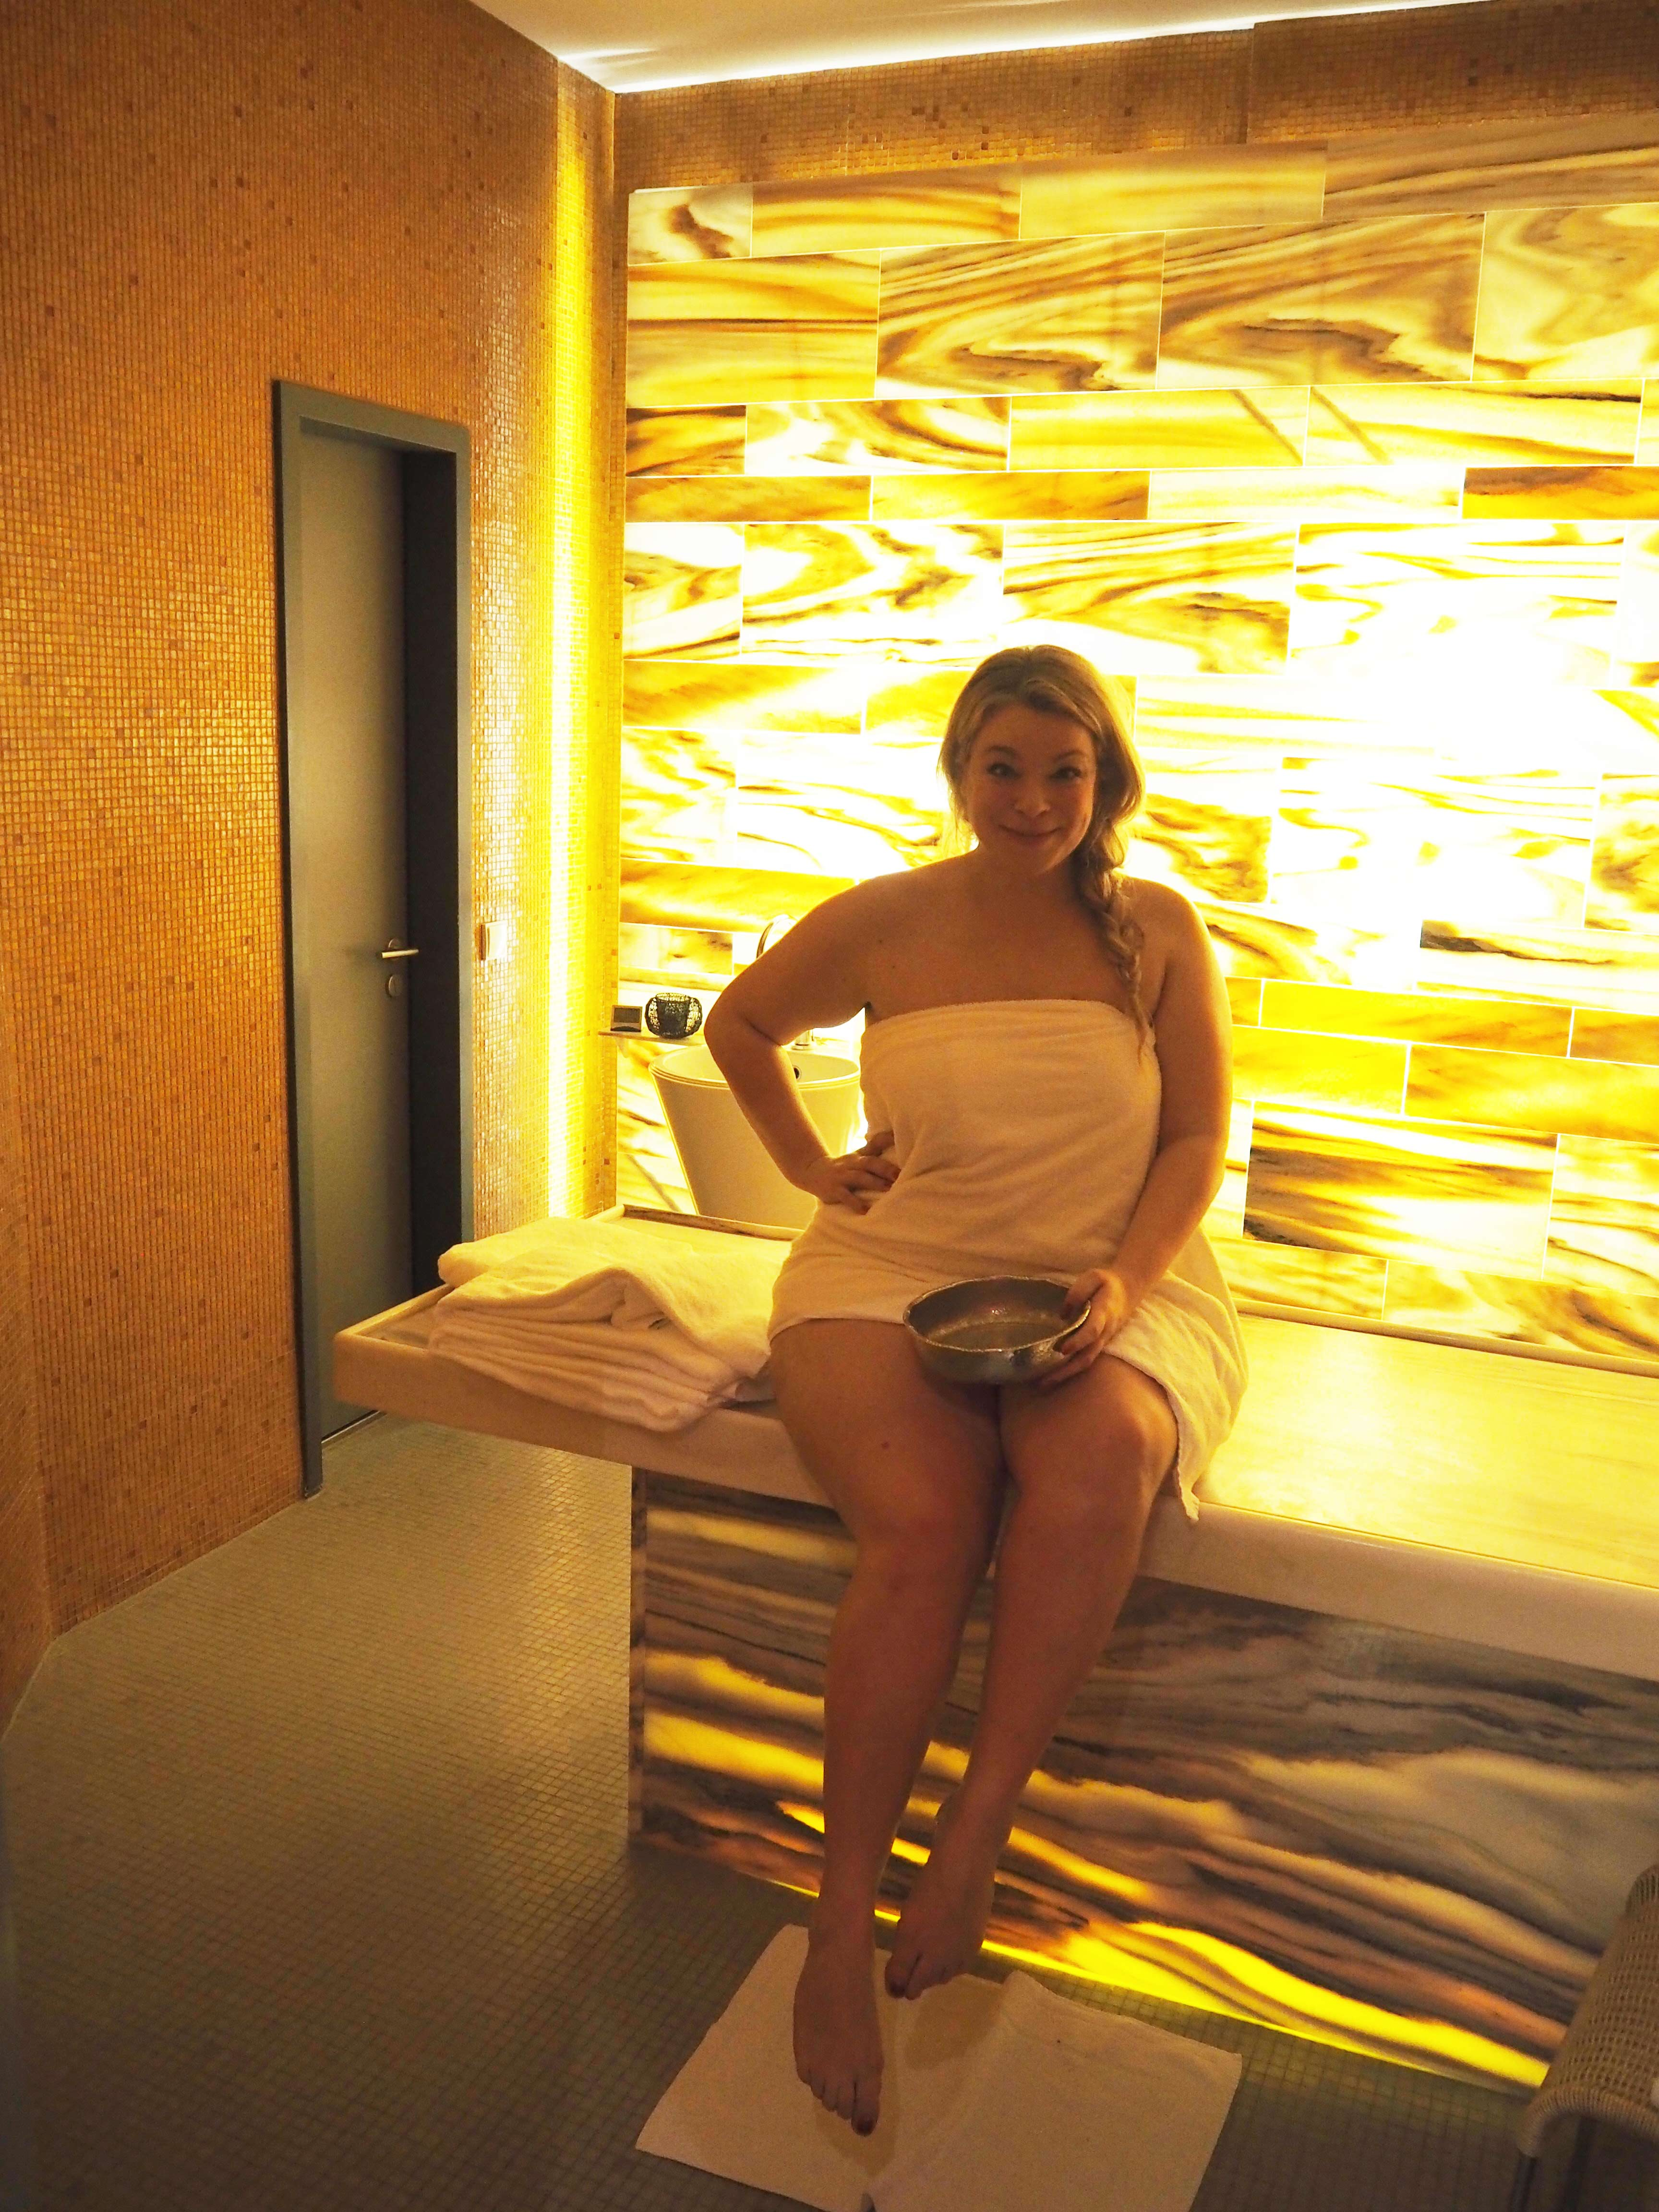 Plussize-Spa-Anwenungen-Massage-Caterina-Megabambi-Blog-Esplanade-Hotel-Livestyle